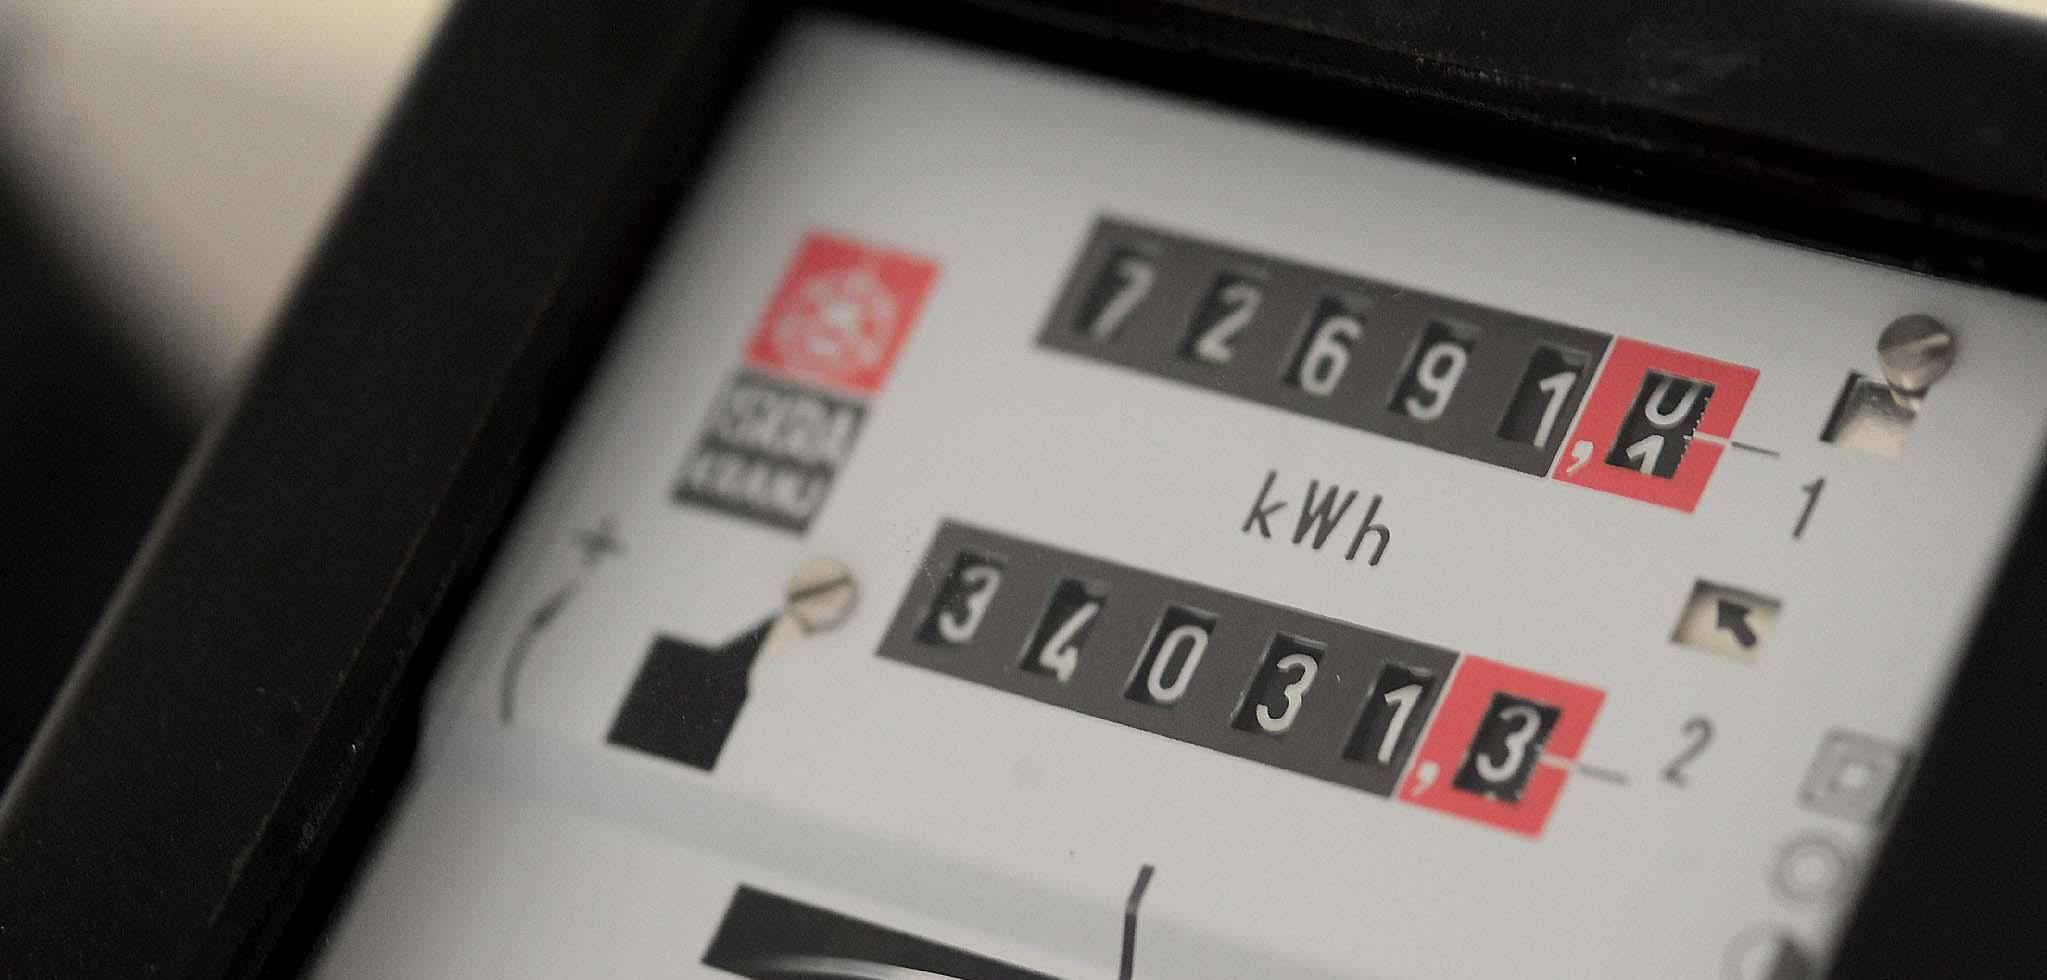 Srbija: Potrošnja struje veća za 10 odsto